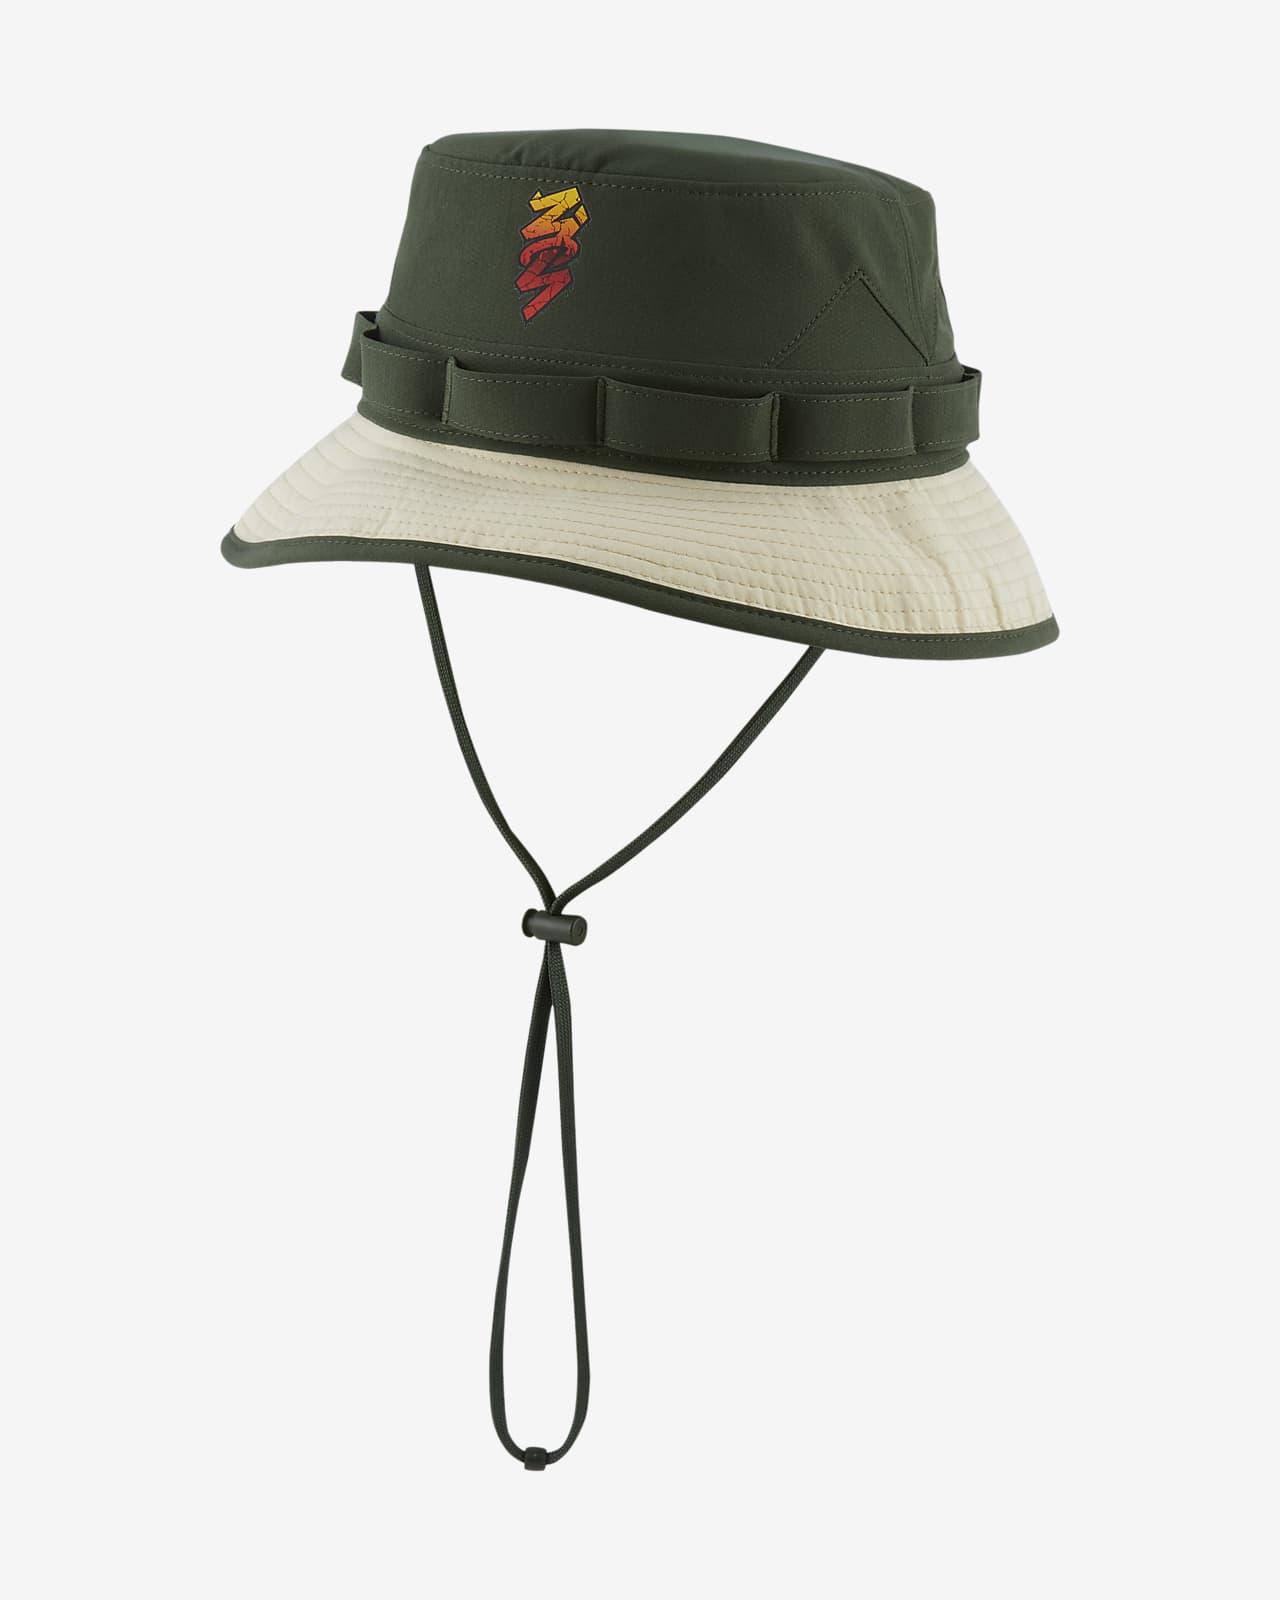 Zion 渔夫运动帽